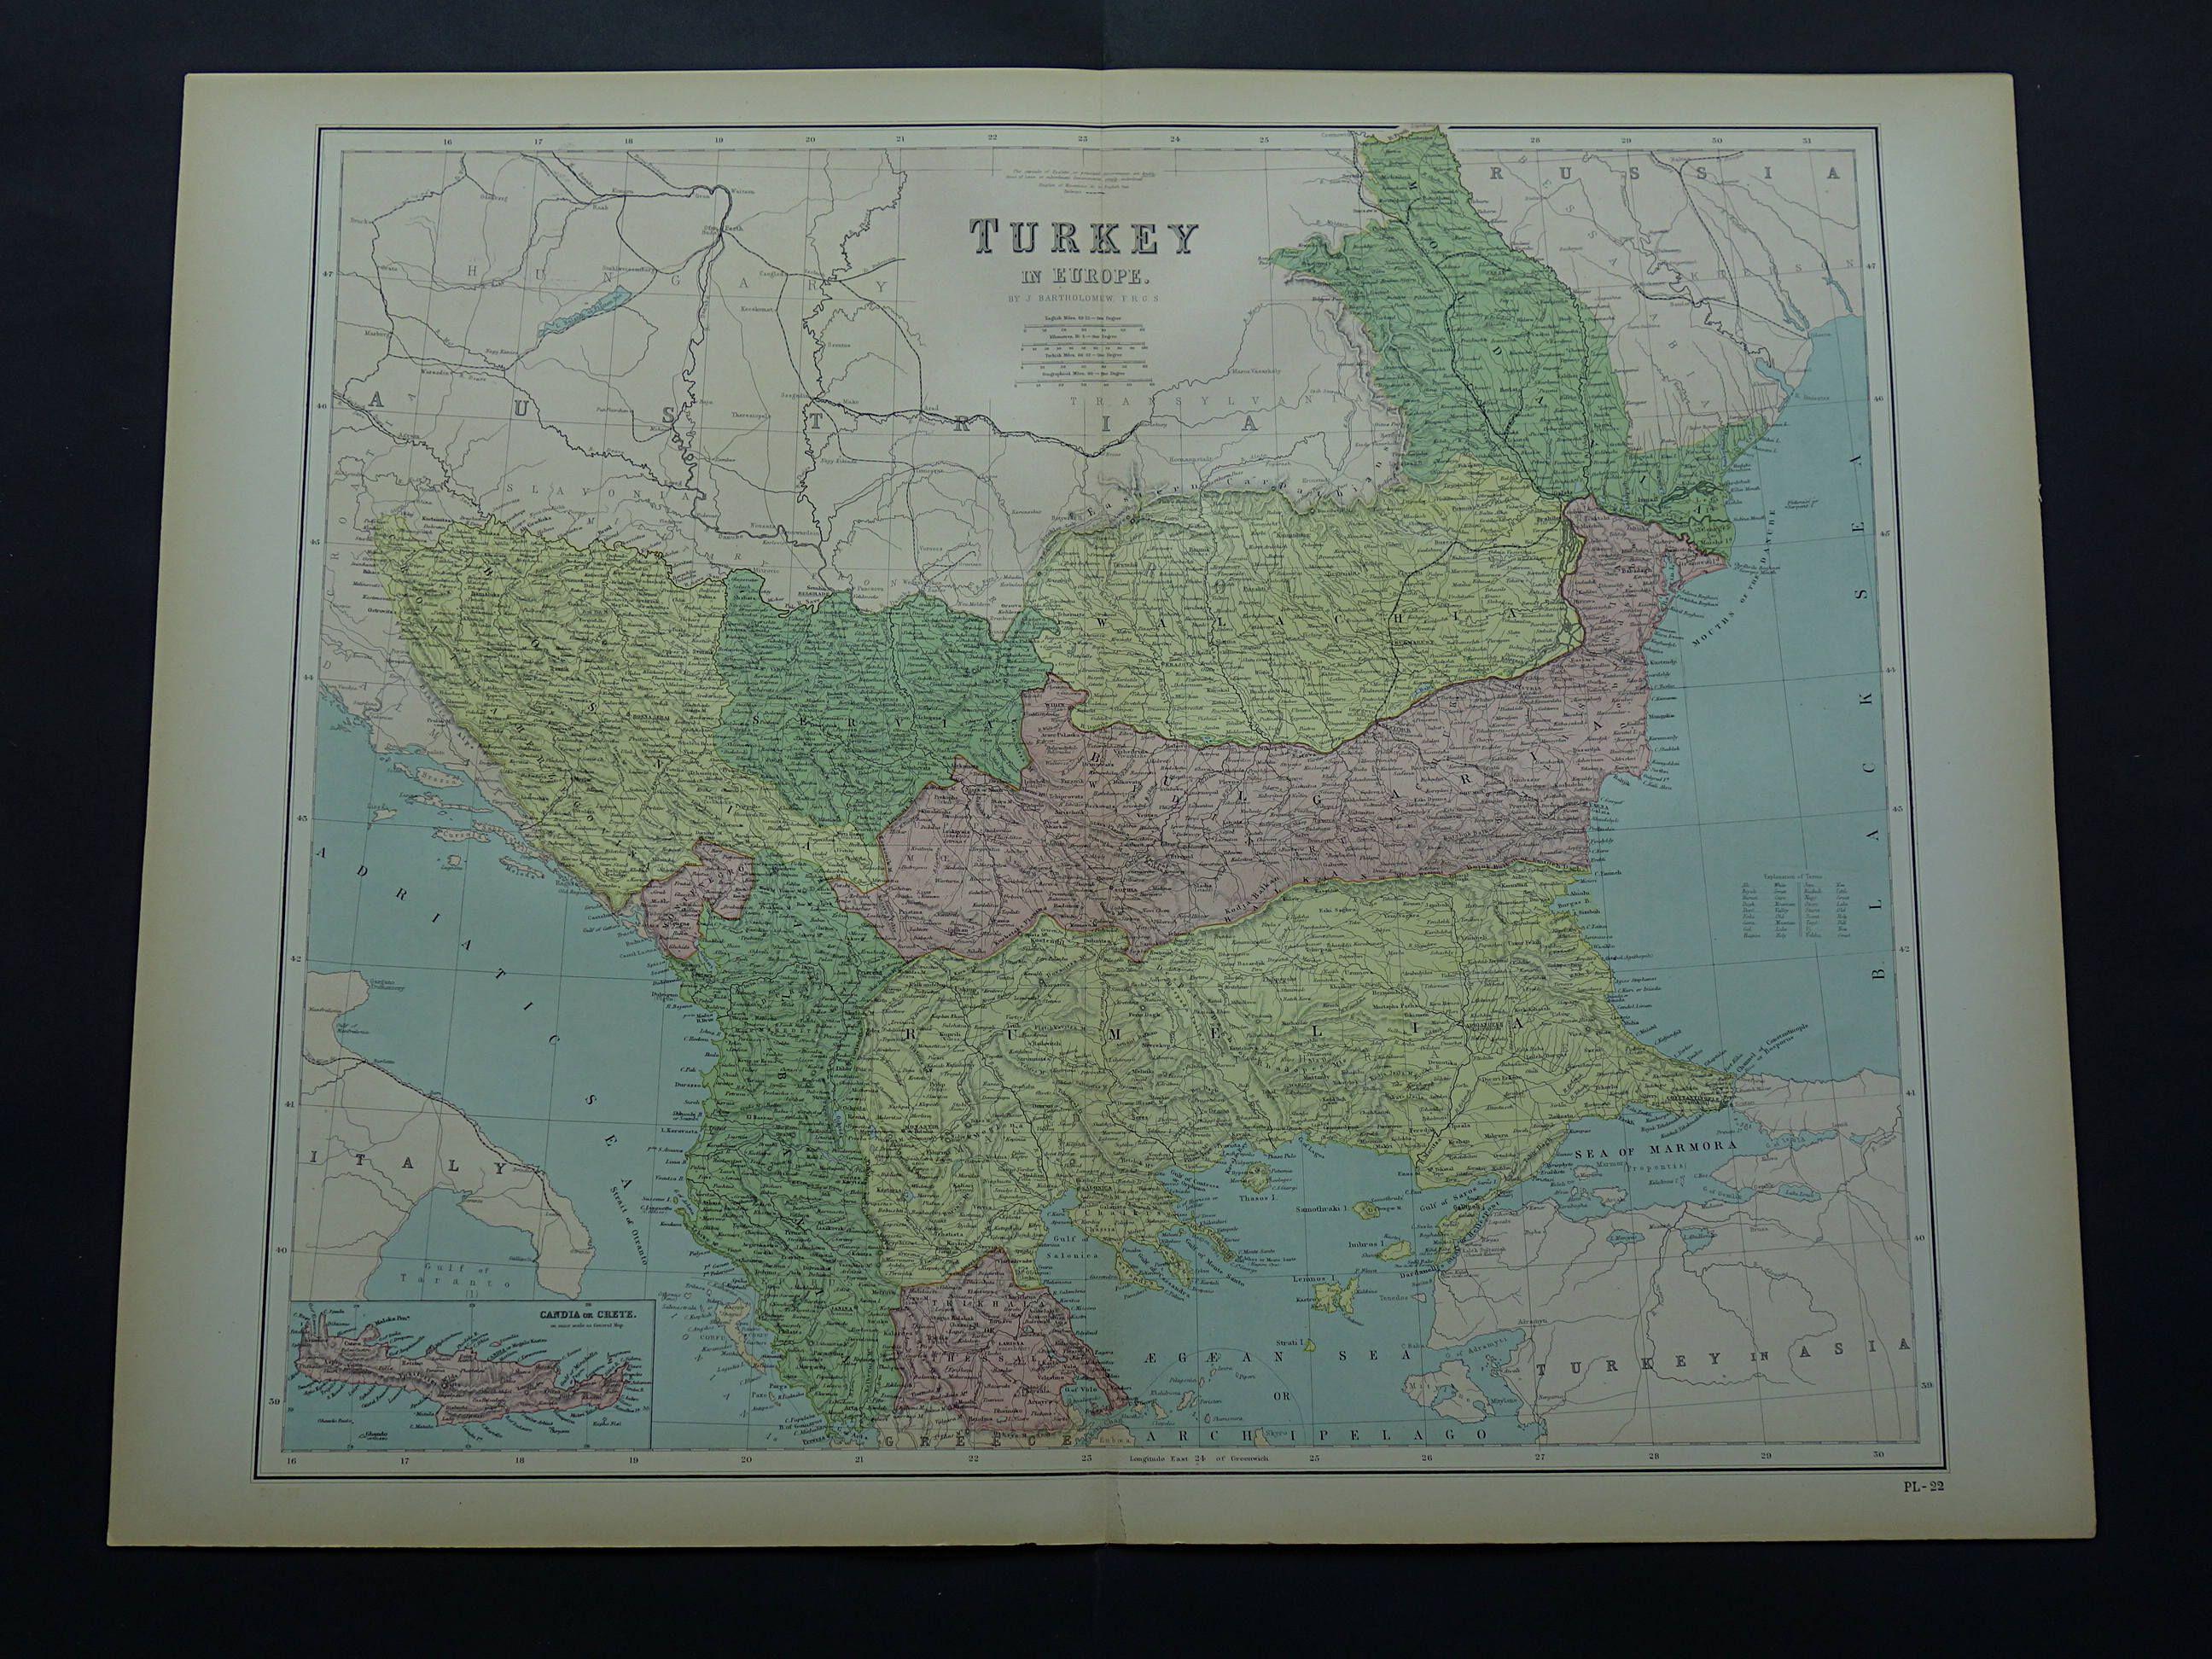 BALKANS old map of European Turkey in 1875 LARGE original antique